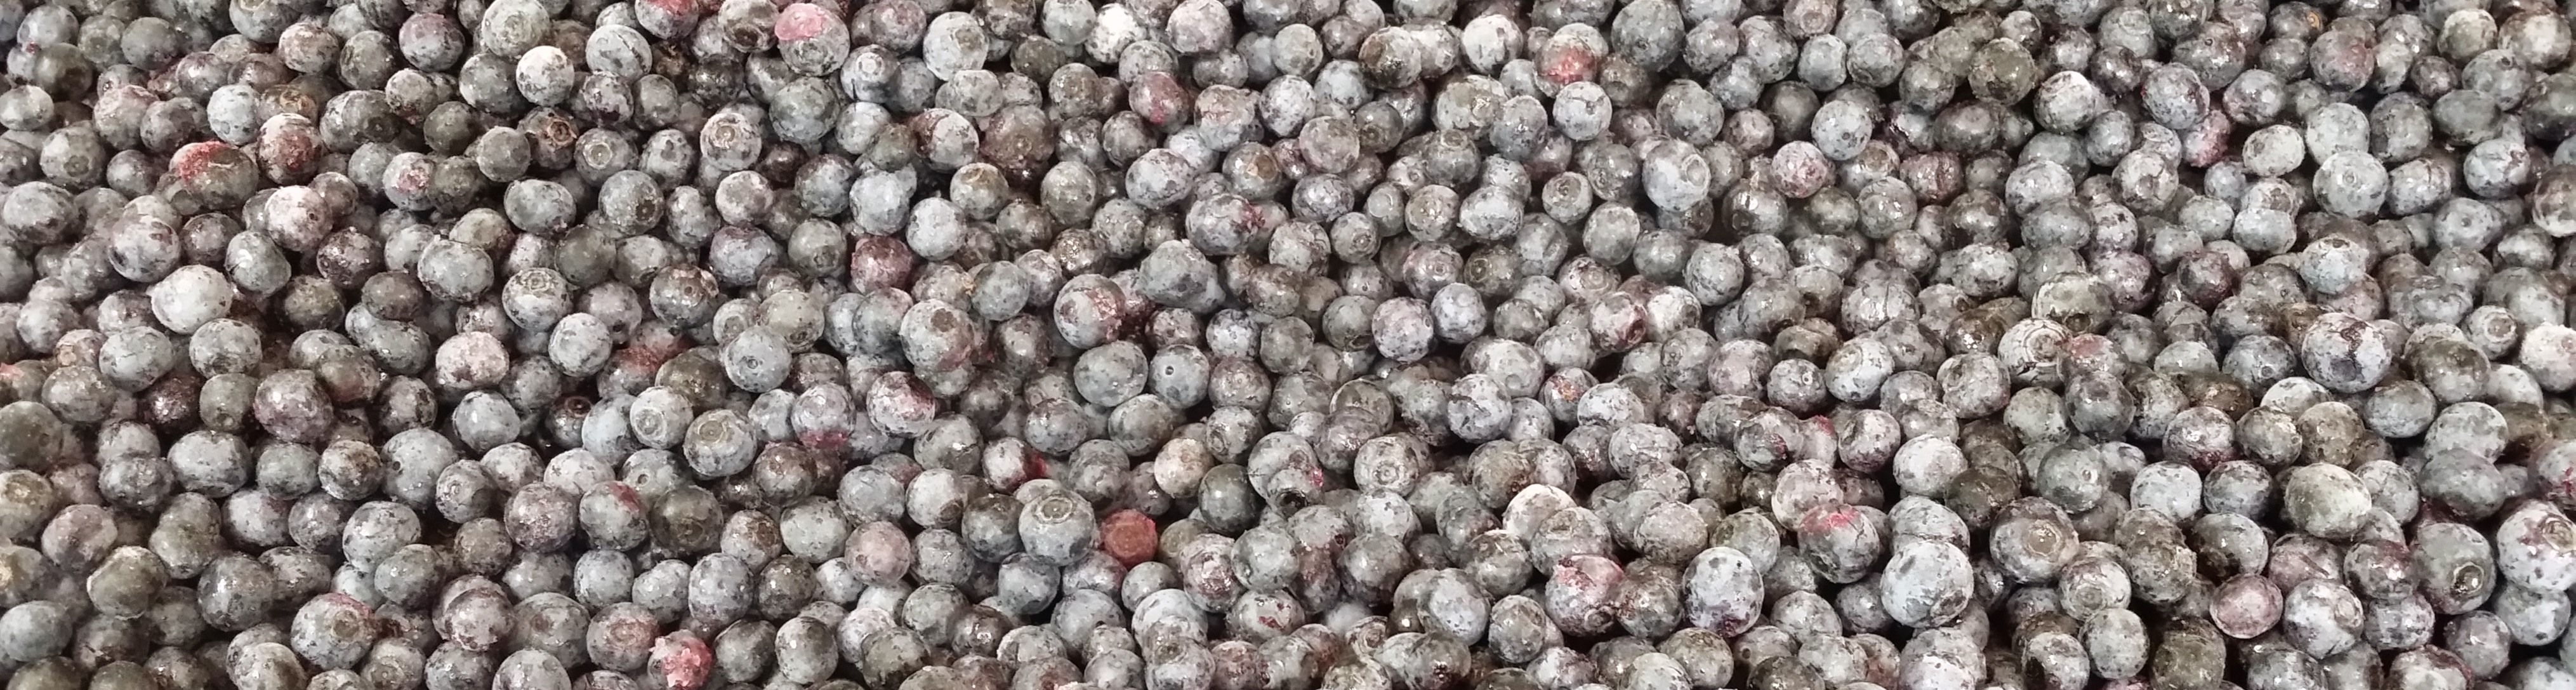 Blueberry Hill U-Pick